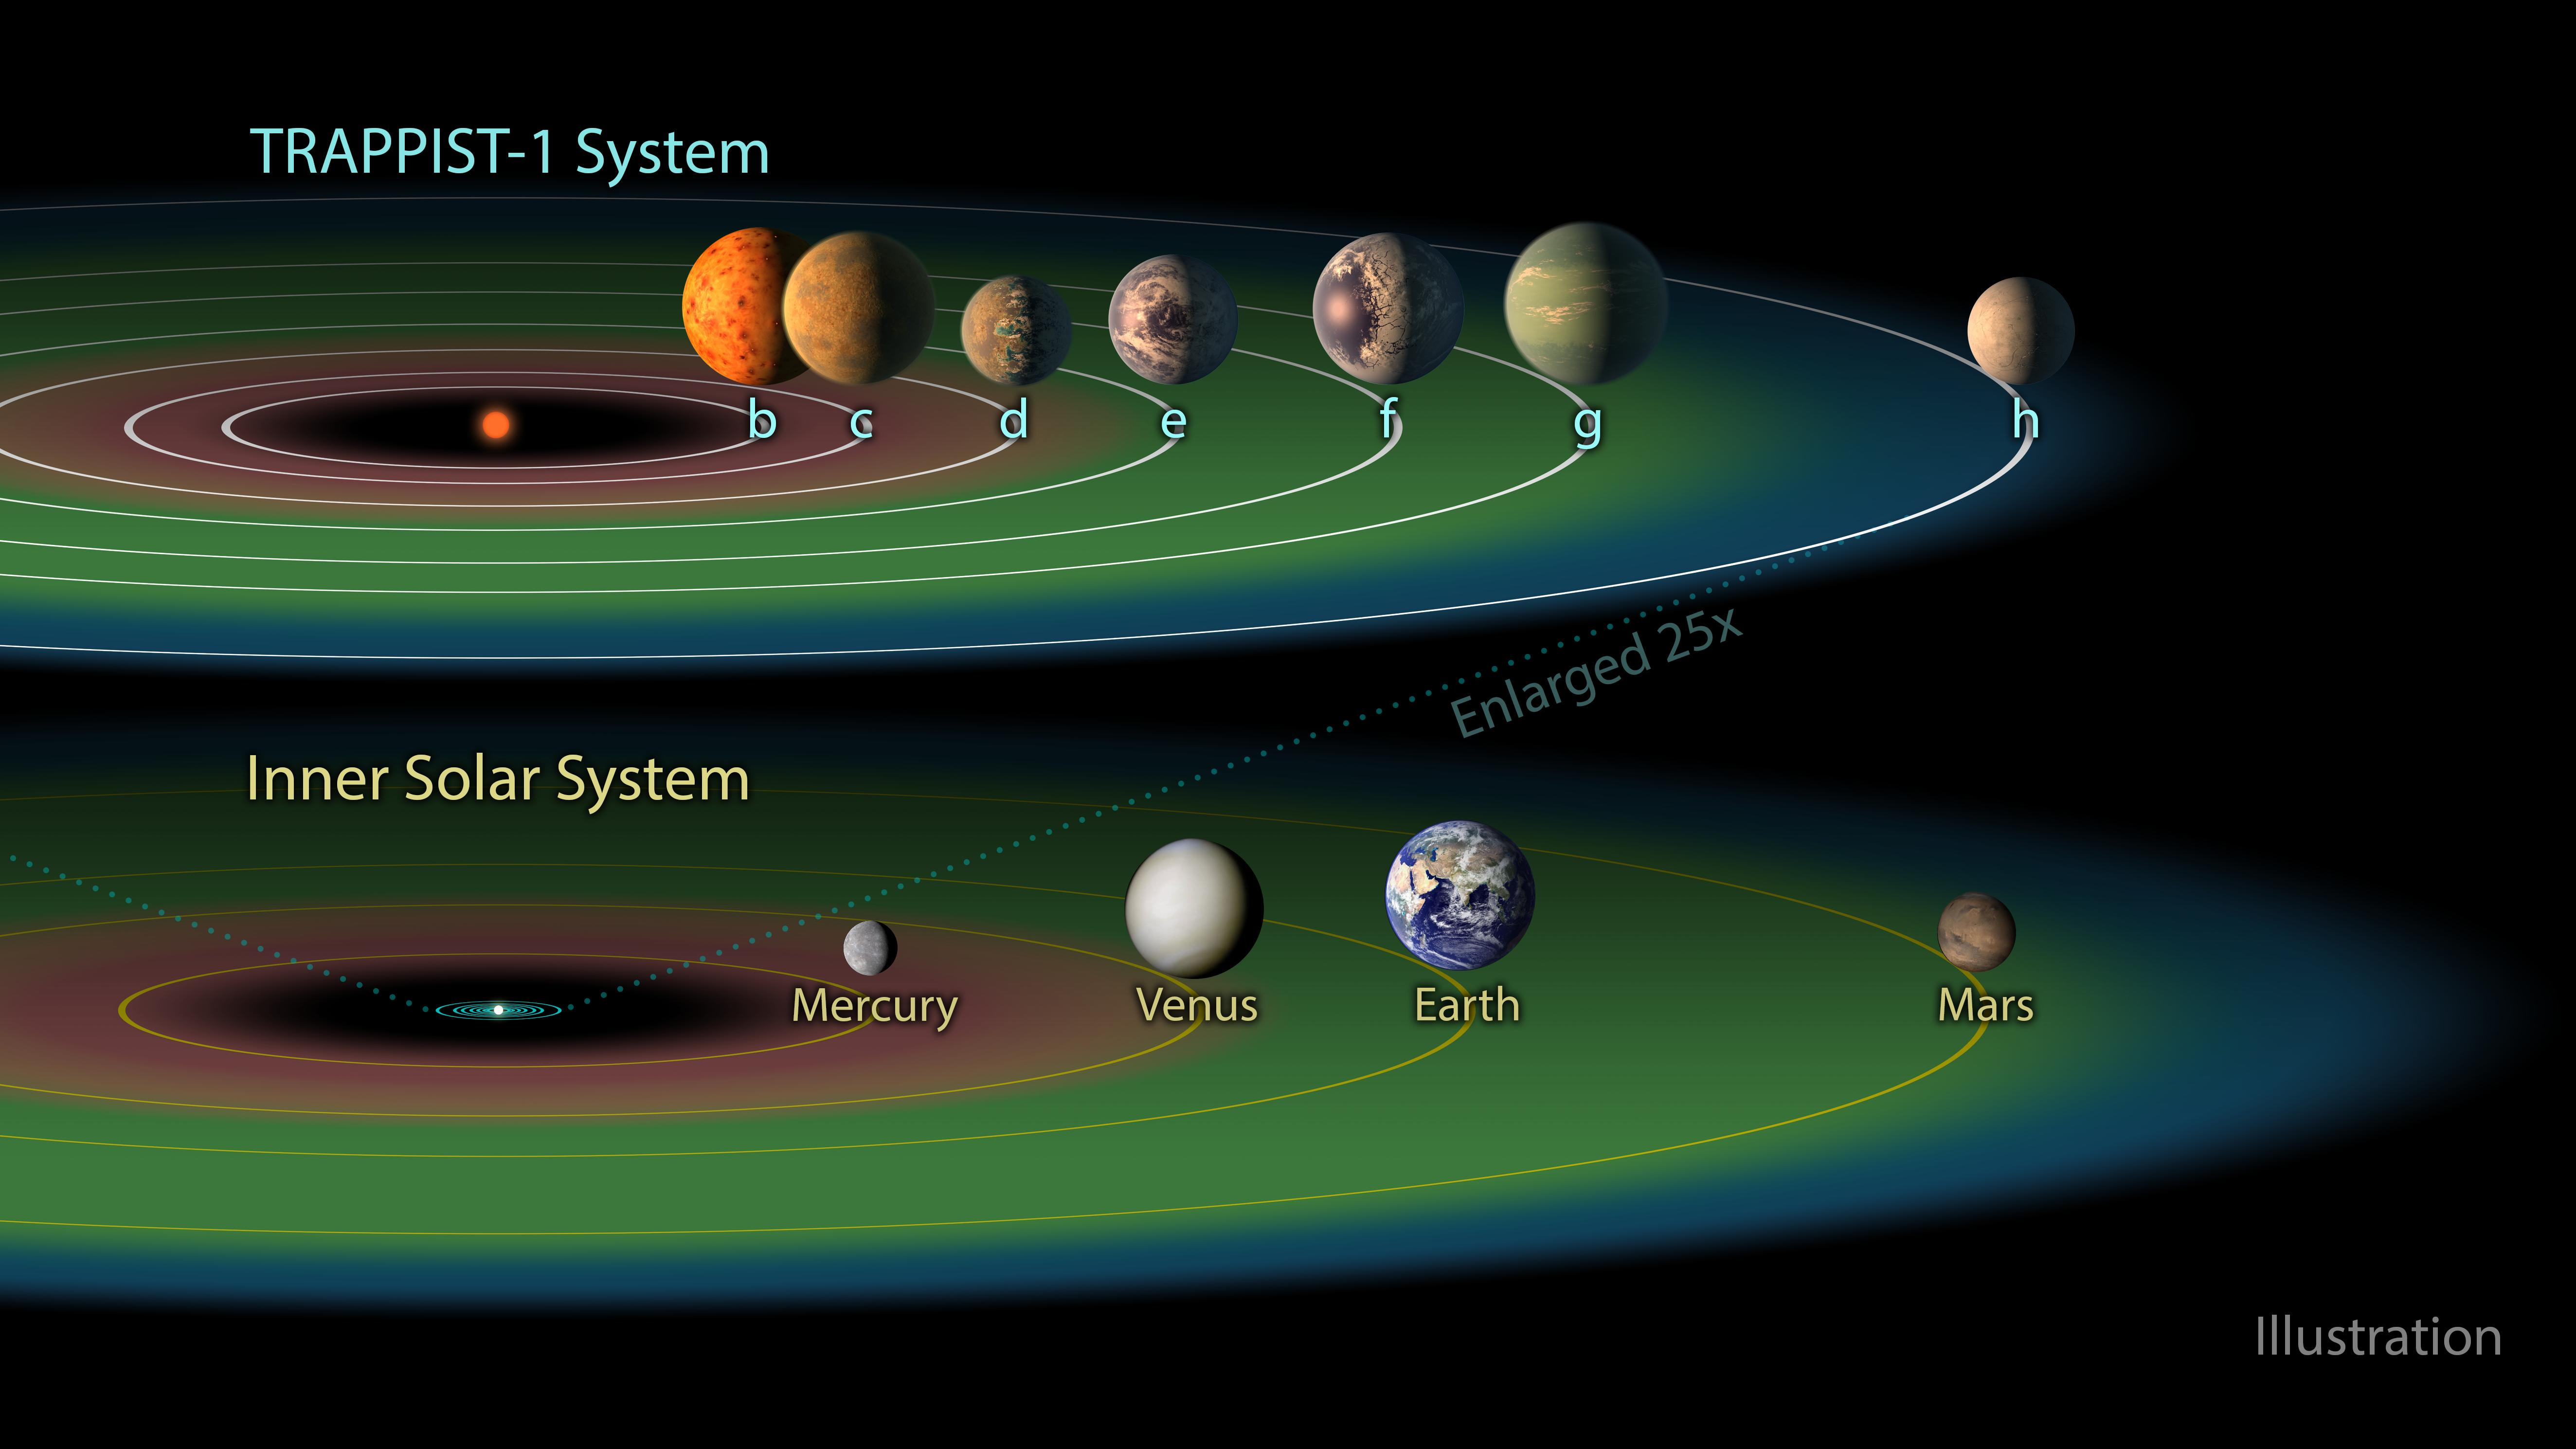 https://upload.wikimedia.org/wikipedia/commons/f/f7/PIA21424_-_The_TRAPPIST-1_Habitable_Zone.jpg